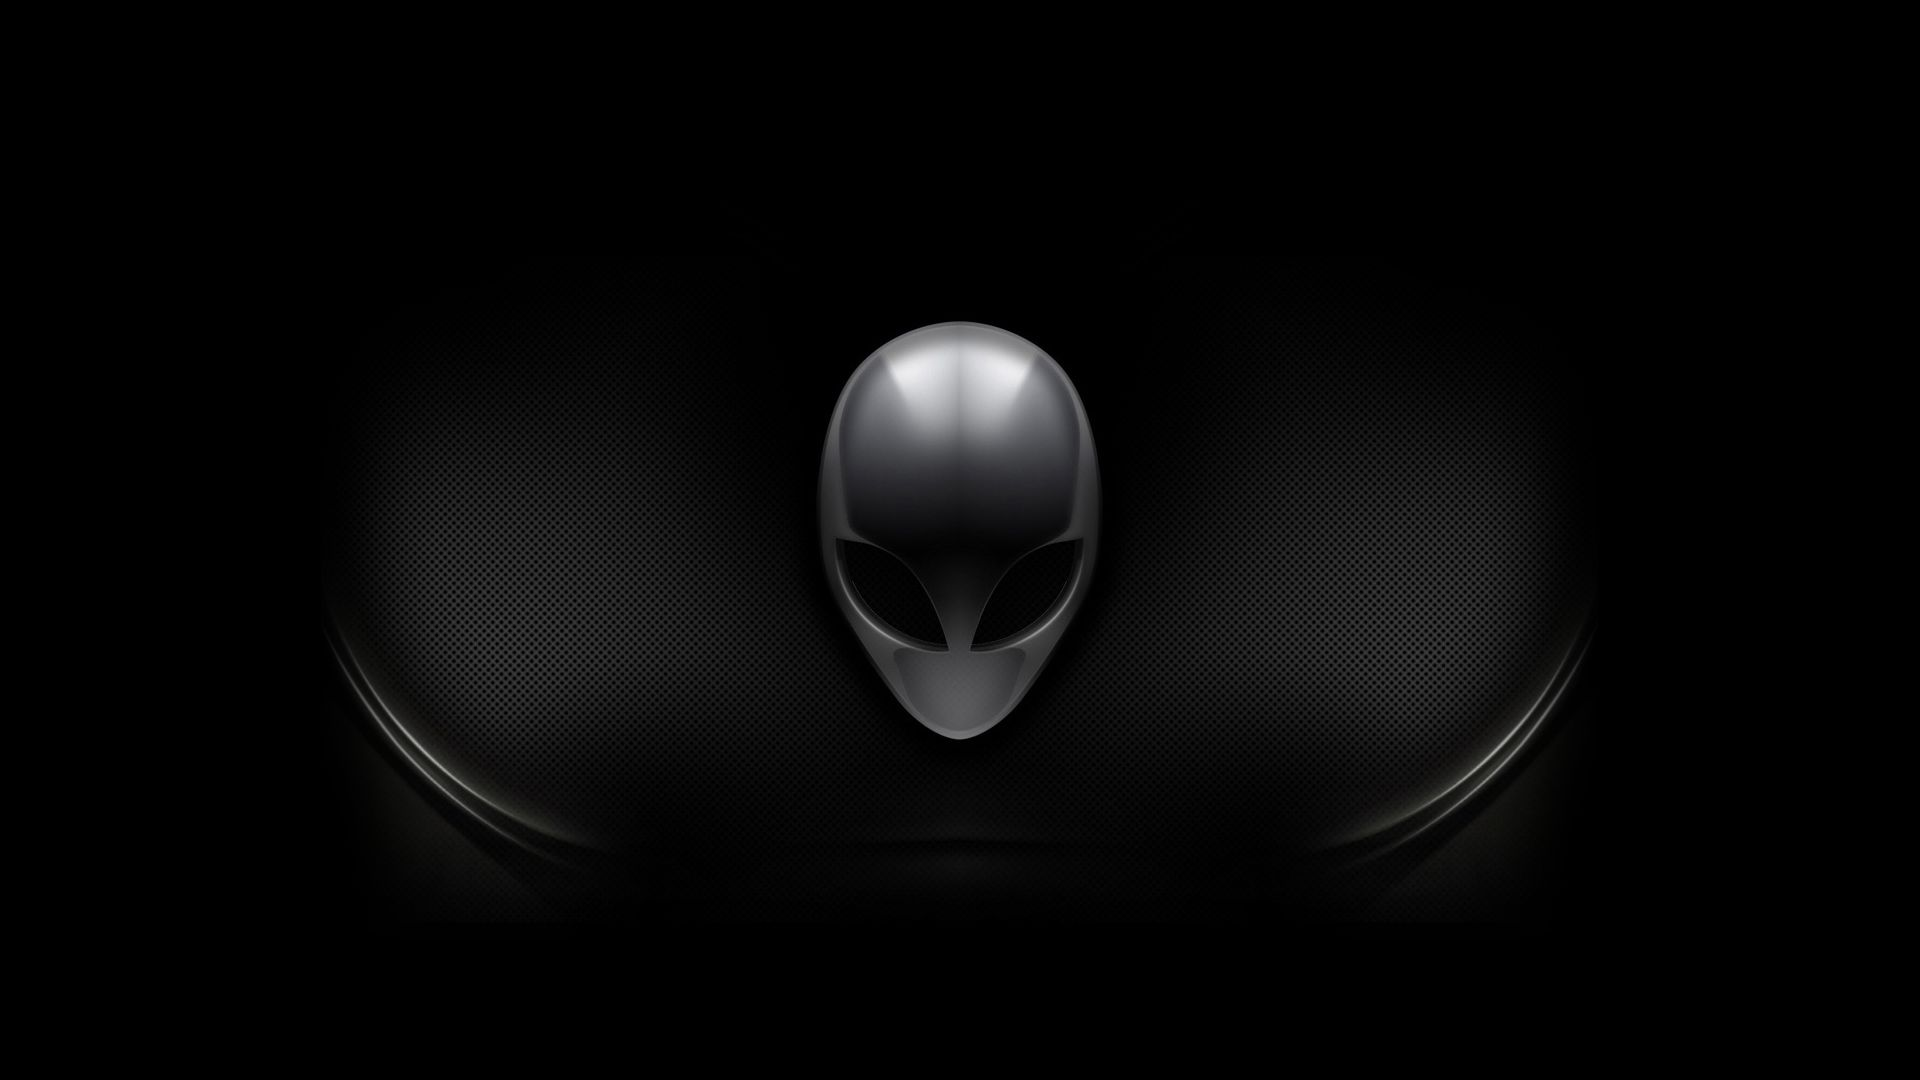 Alienware Dark Logo Wallpaper Hd